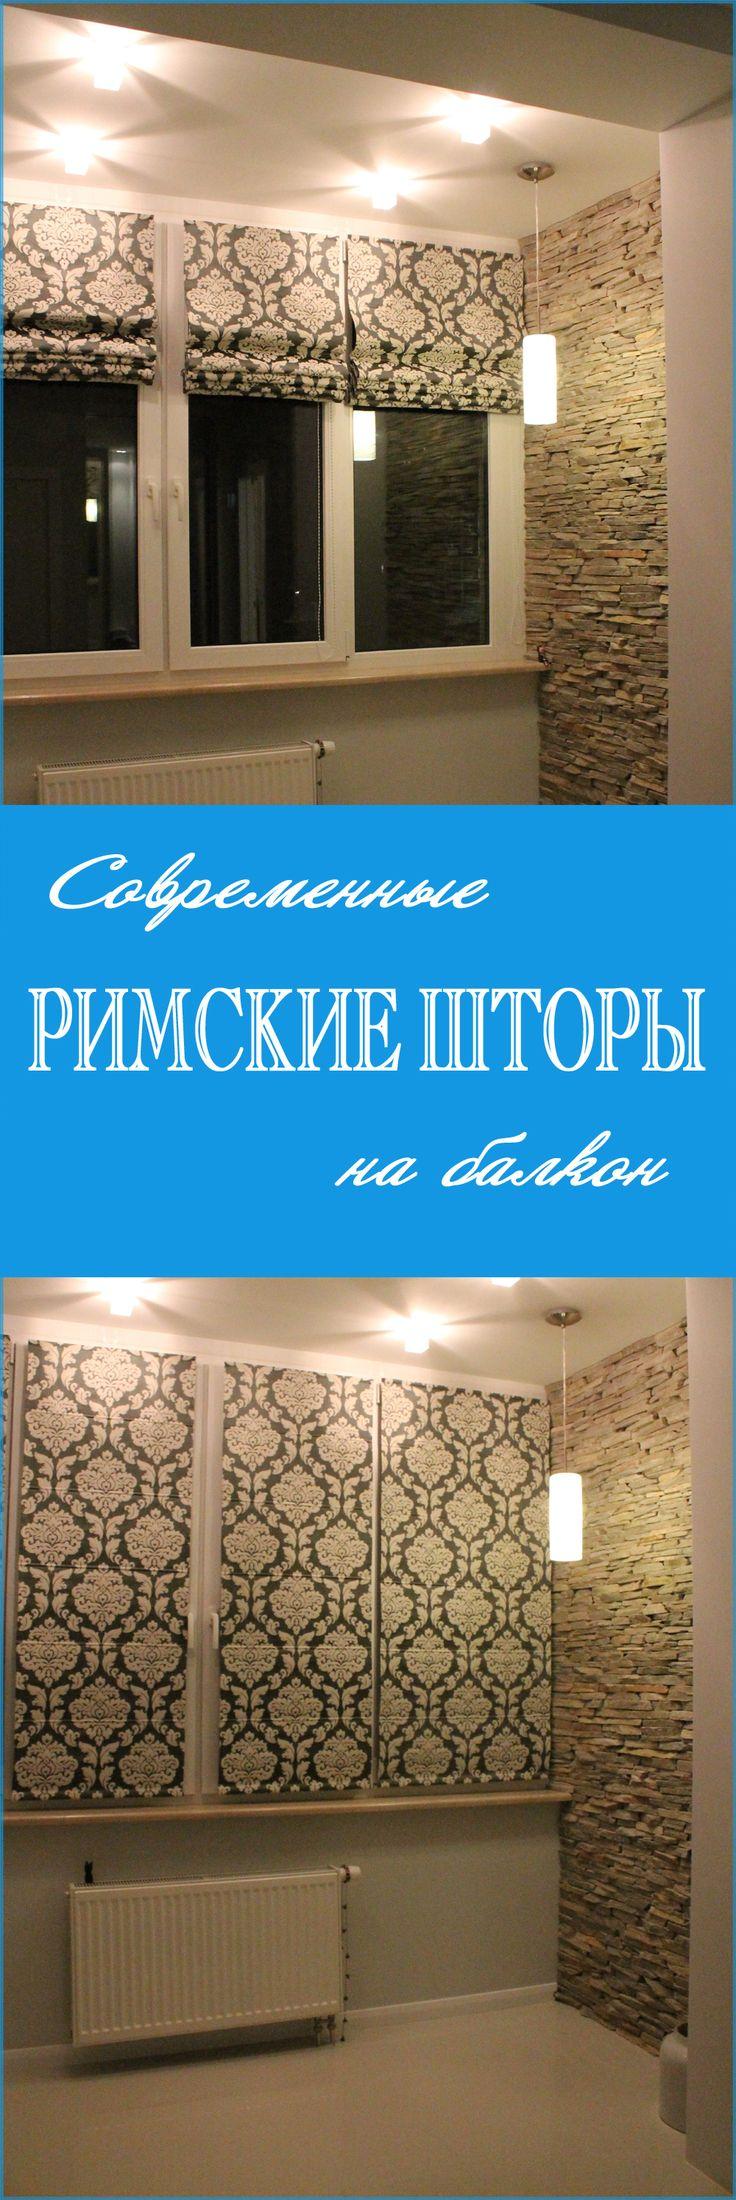 best Шторы на кухню images on pinterest bedroom contemporary